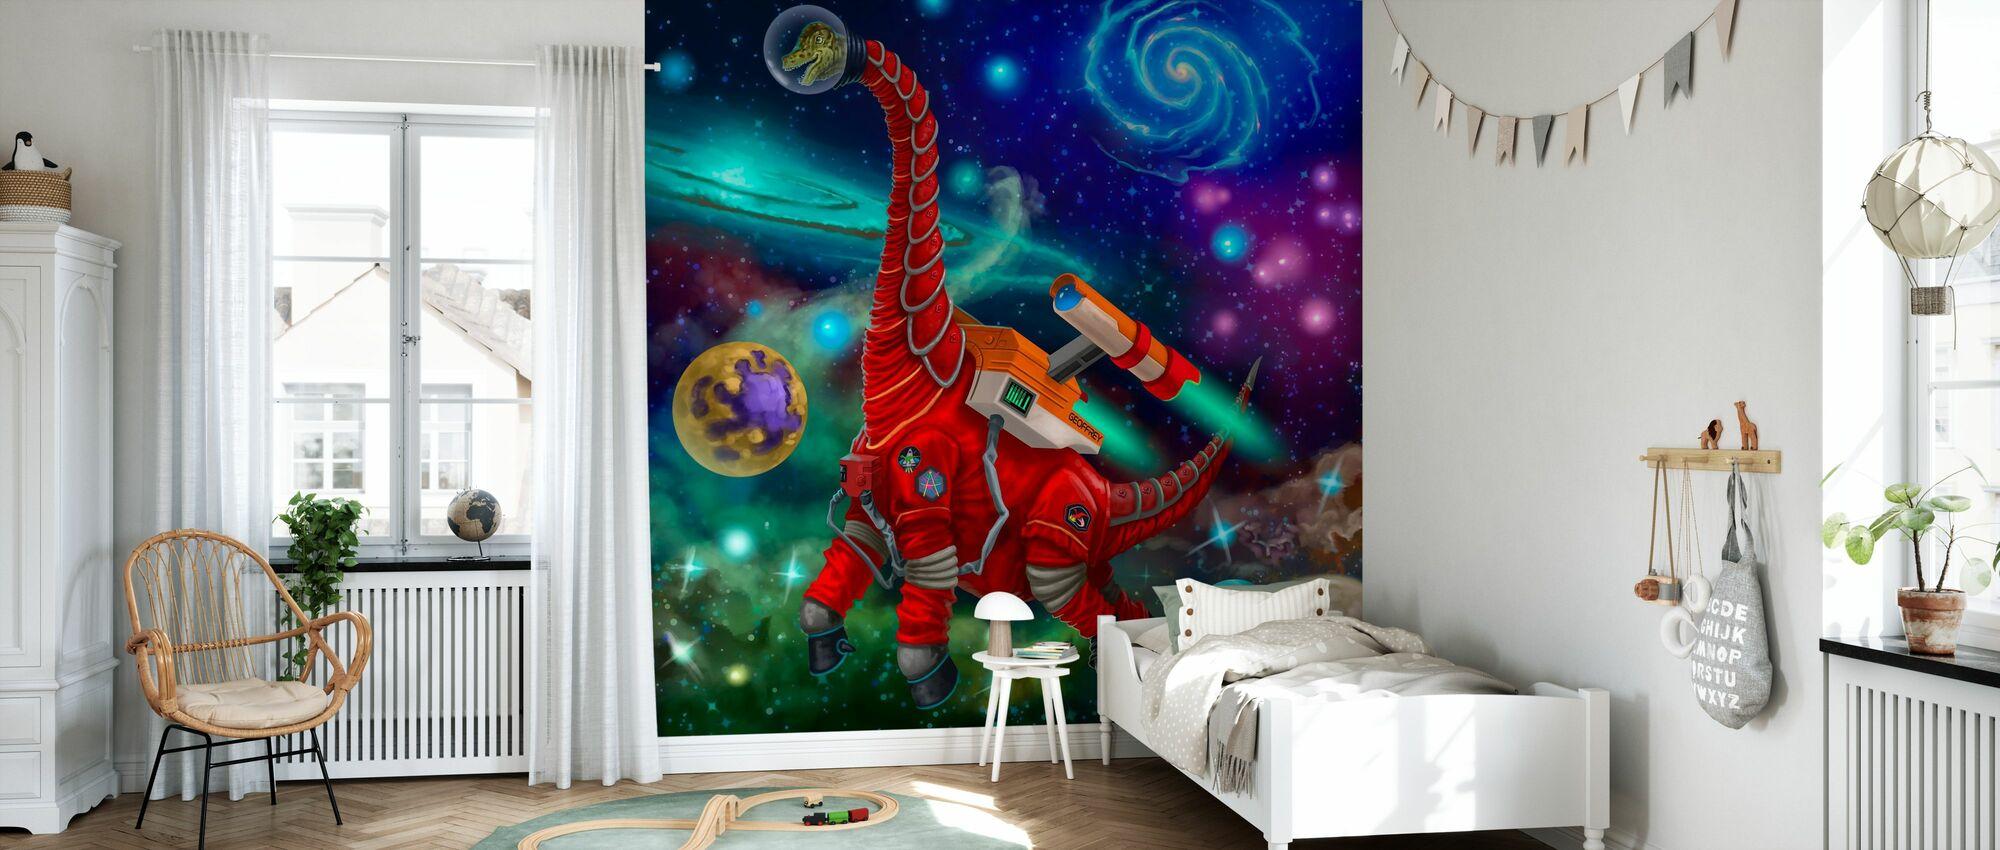 Giraffititan Astronaut - Wallpaper - Kids Room